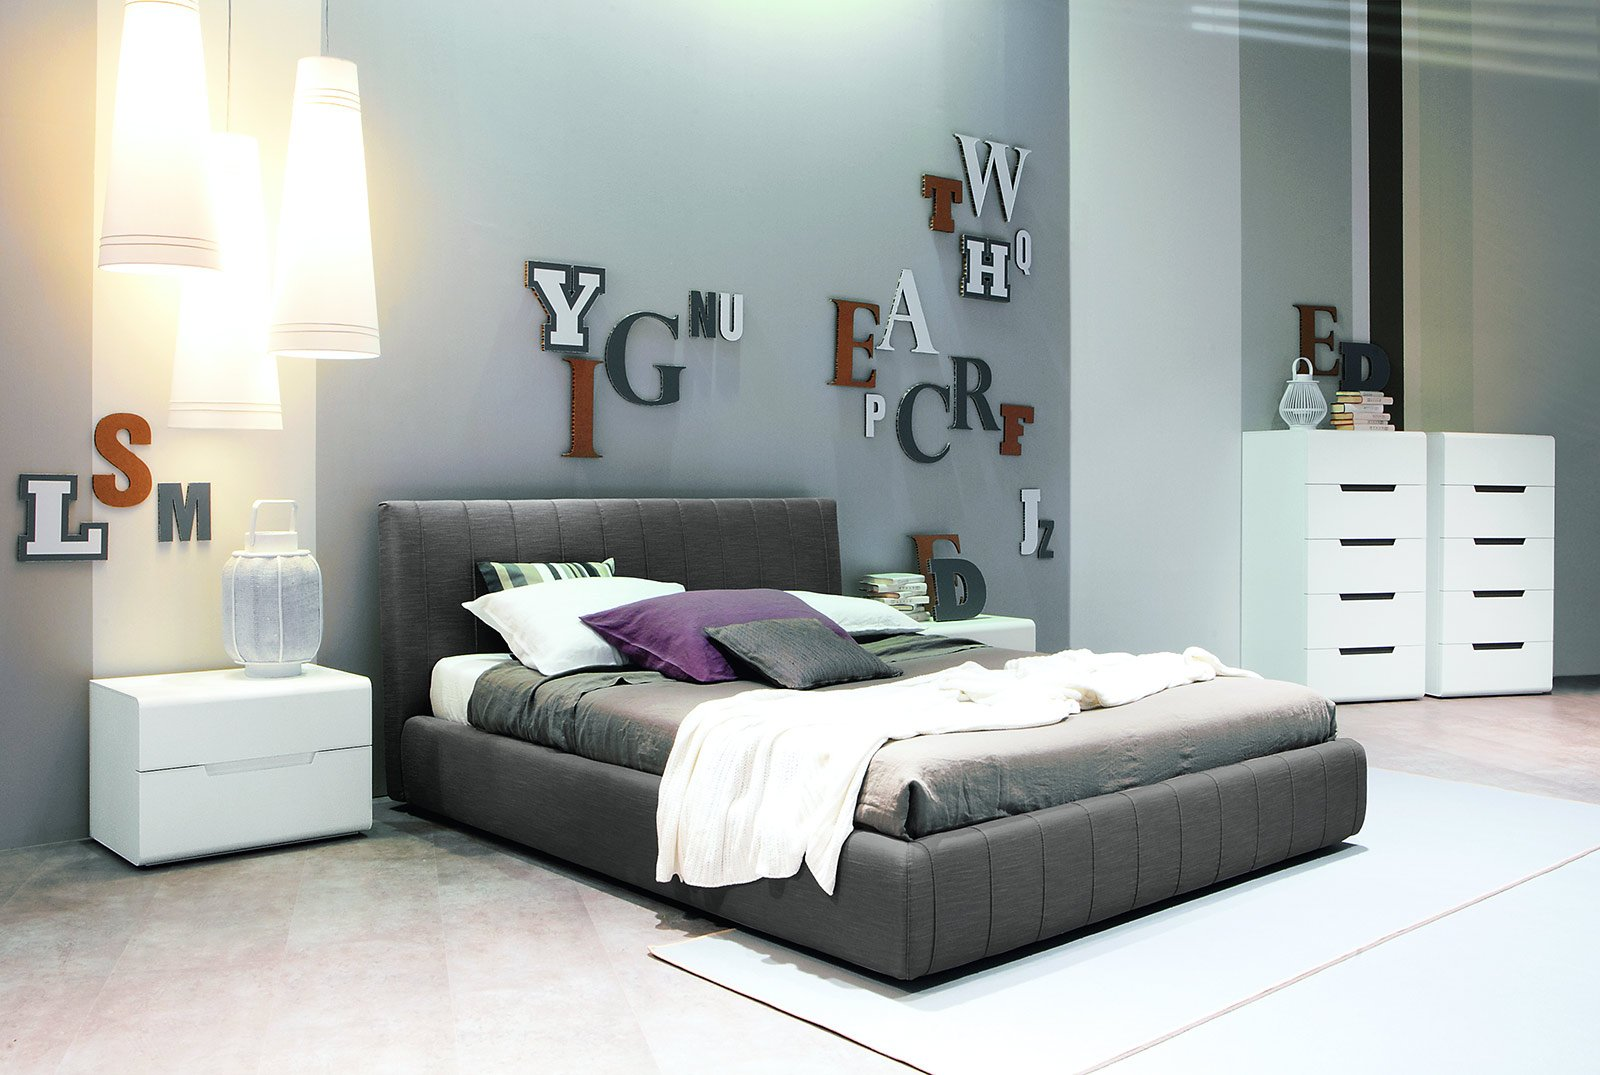 Capitonn letti imbottiti moderni cose di casa for Letti moderni